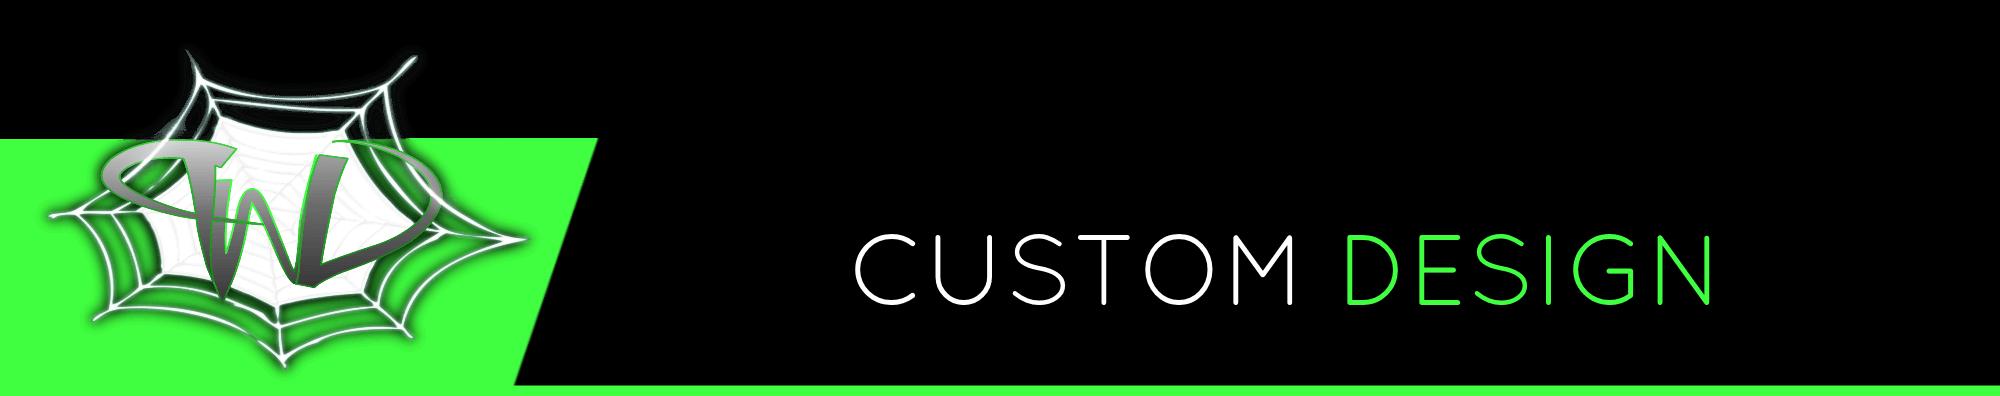 Pittsburgh web designs llc custom website designer seo we do not use downloaded templates or generic do it yourself websites solutioingenieria Gallery